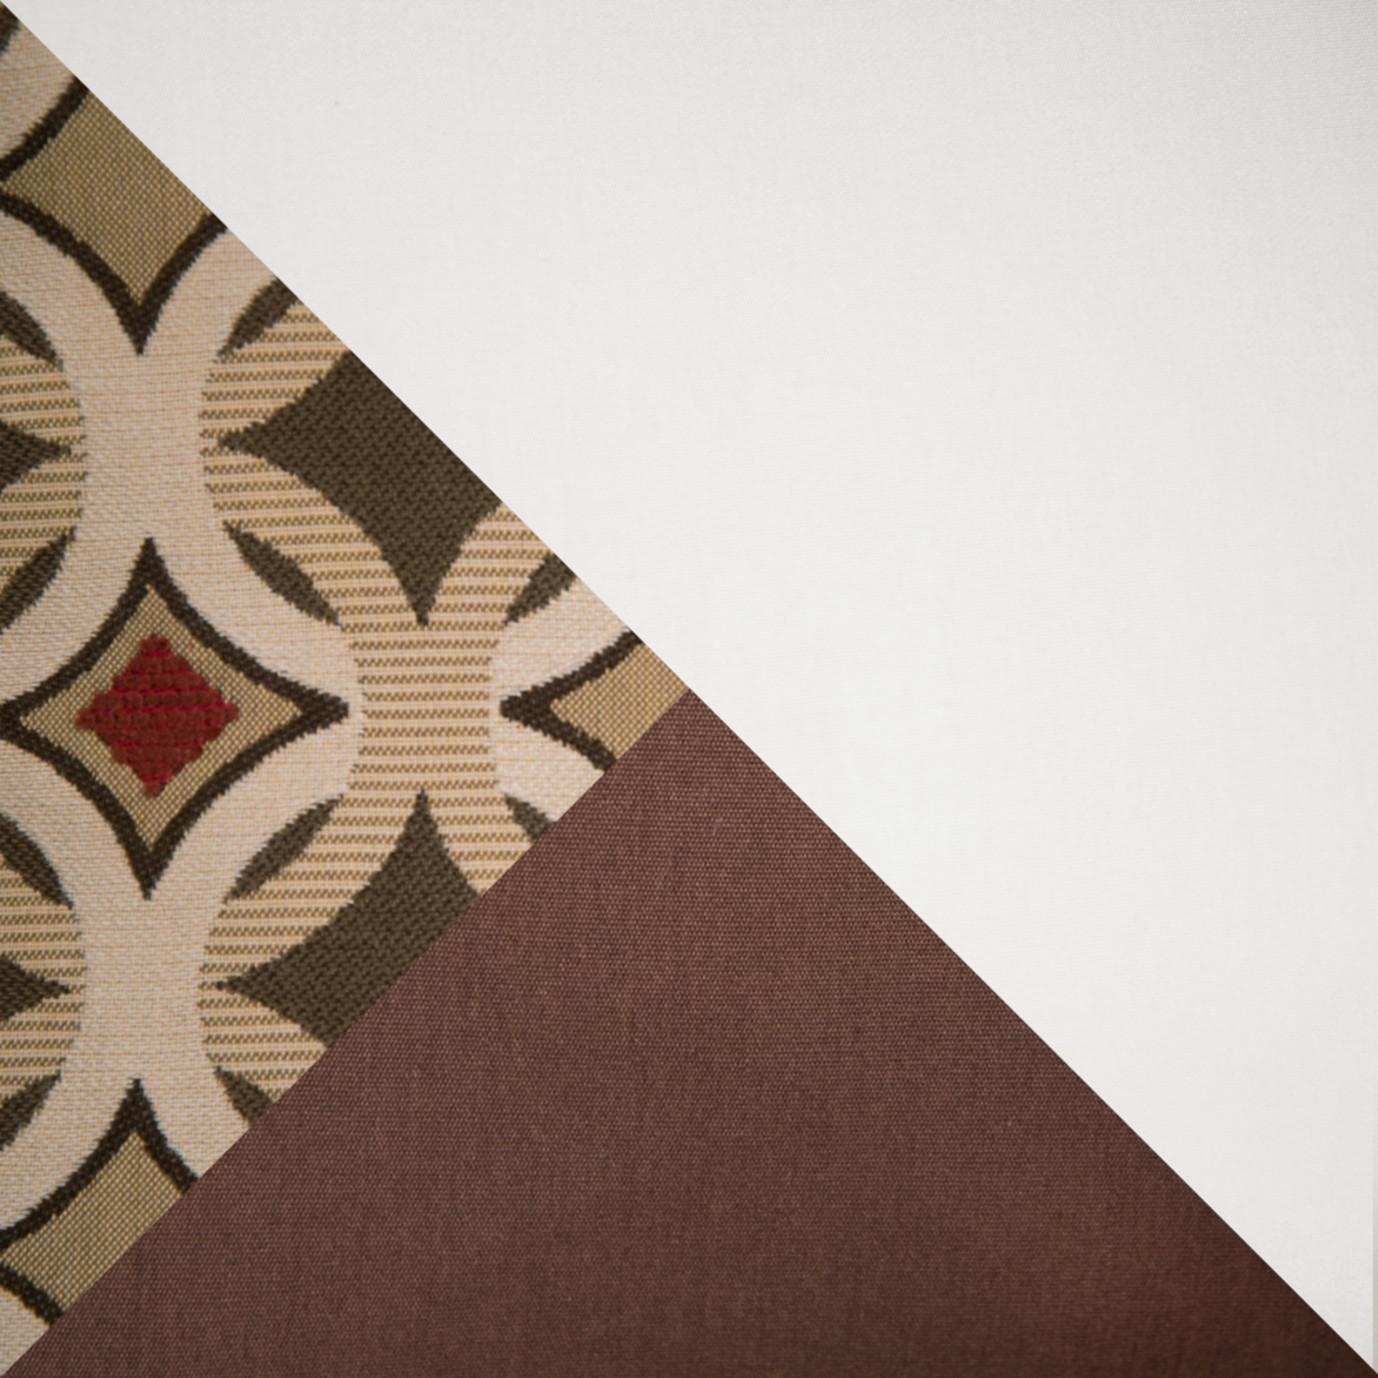 Barcelo™ 4 Piece Motion Club & Sofa Set - Moroccan Cream